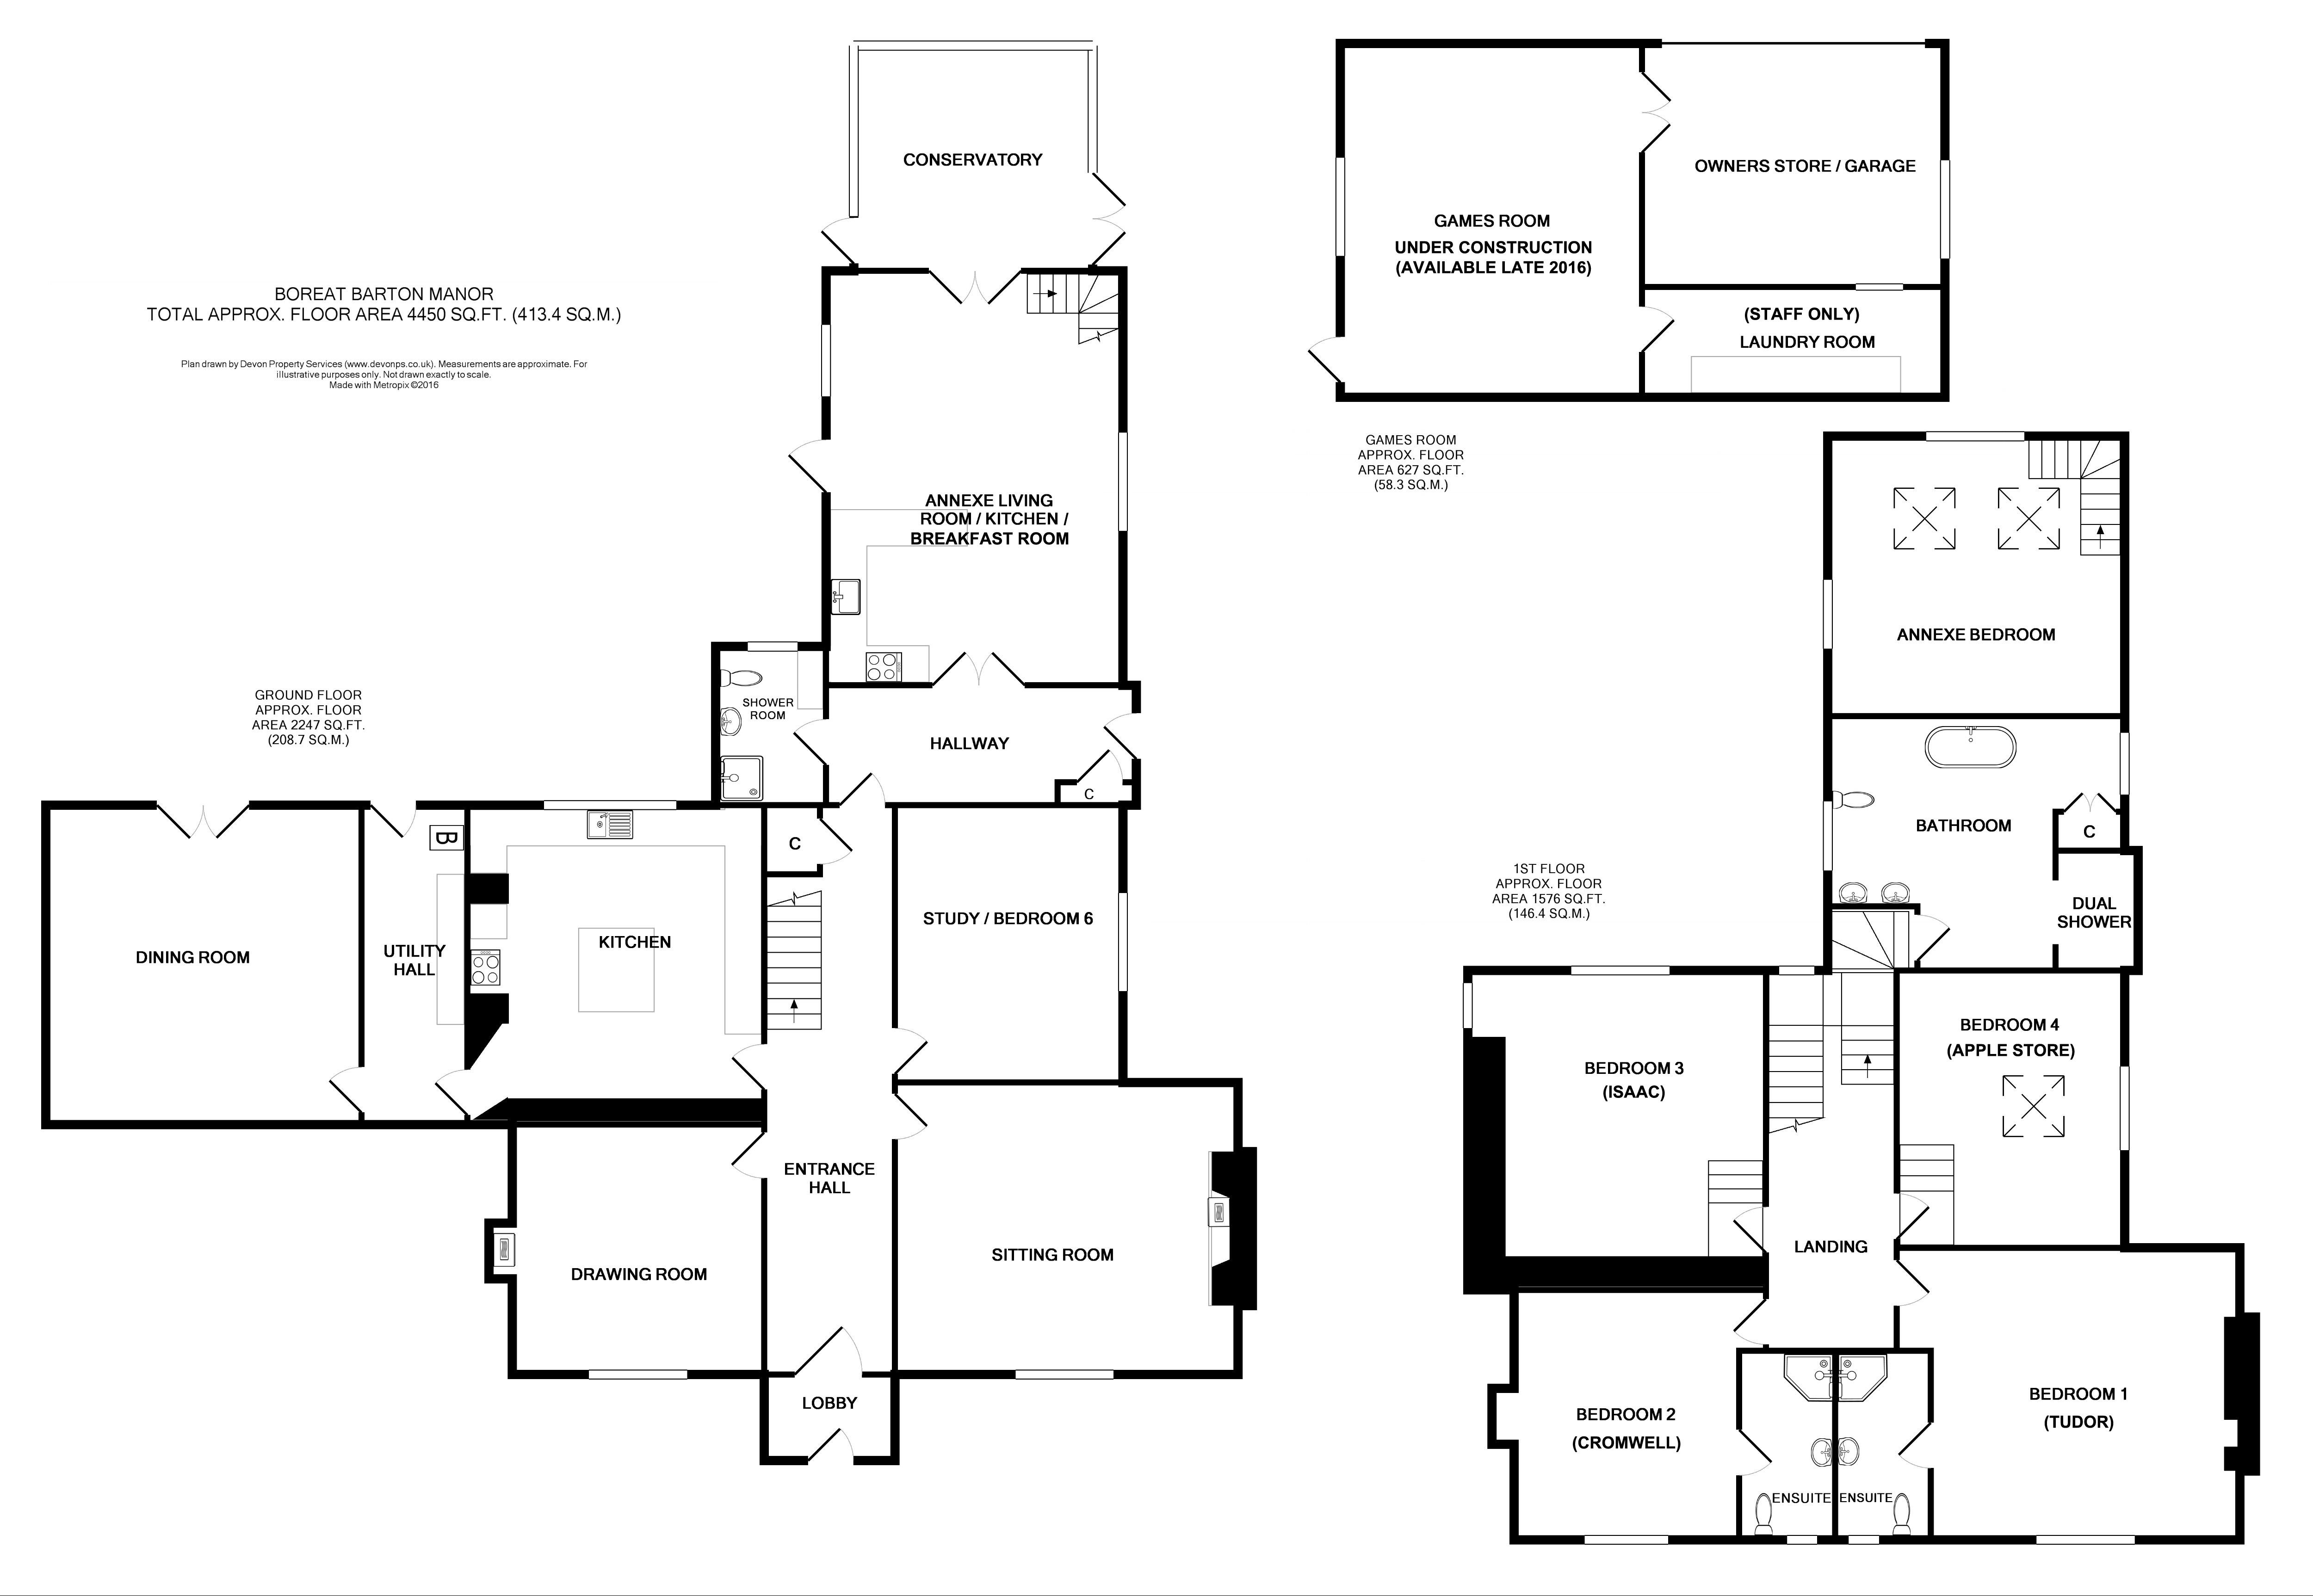 Boreat Manor Self Catering Holiday Home In Devon Floor Plan